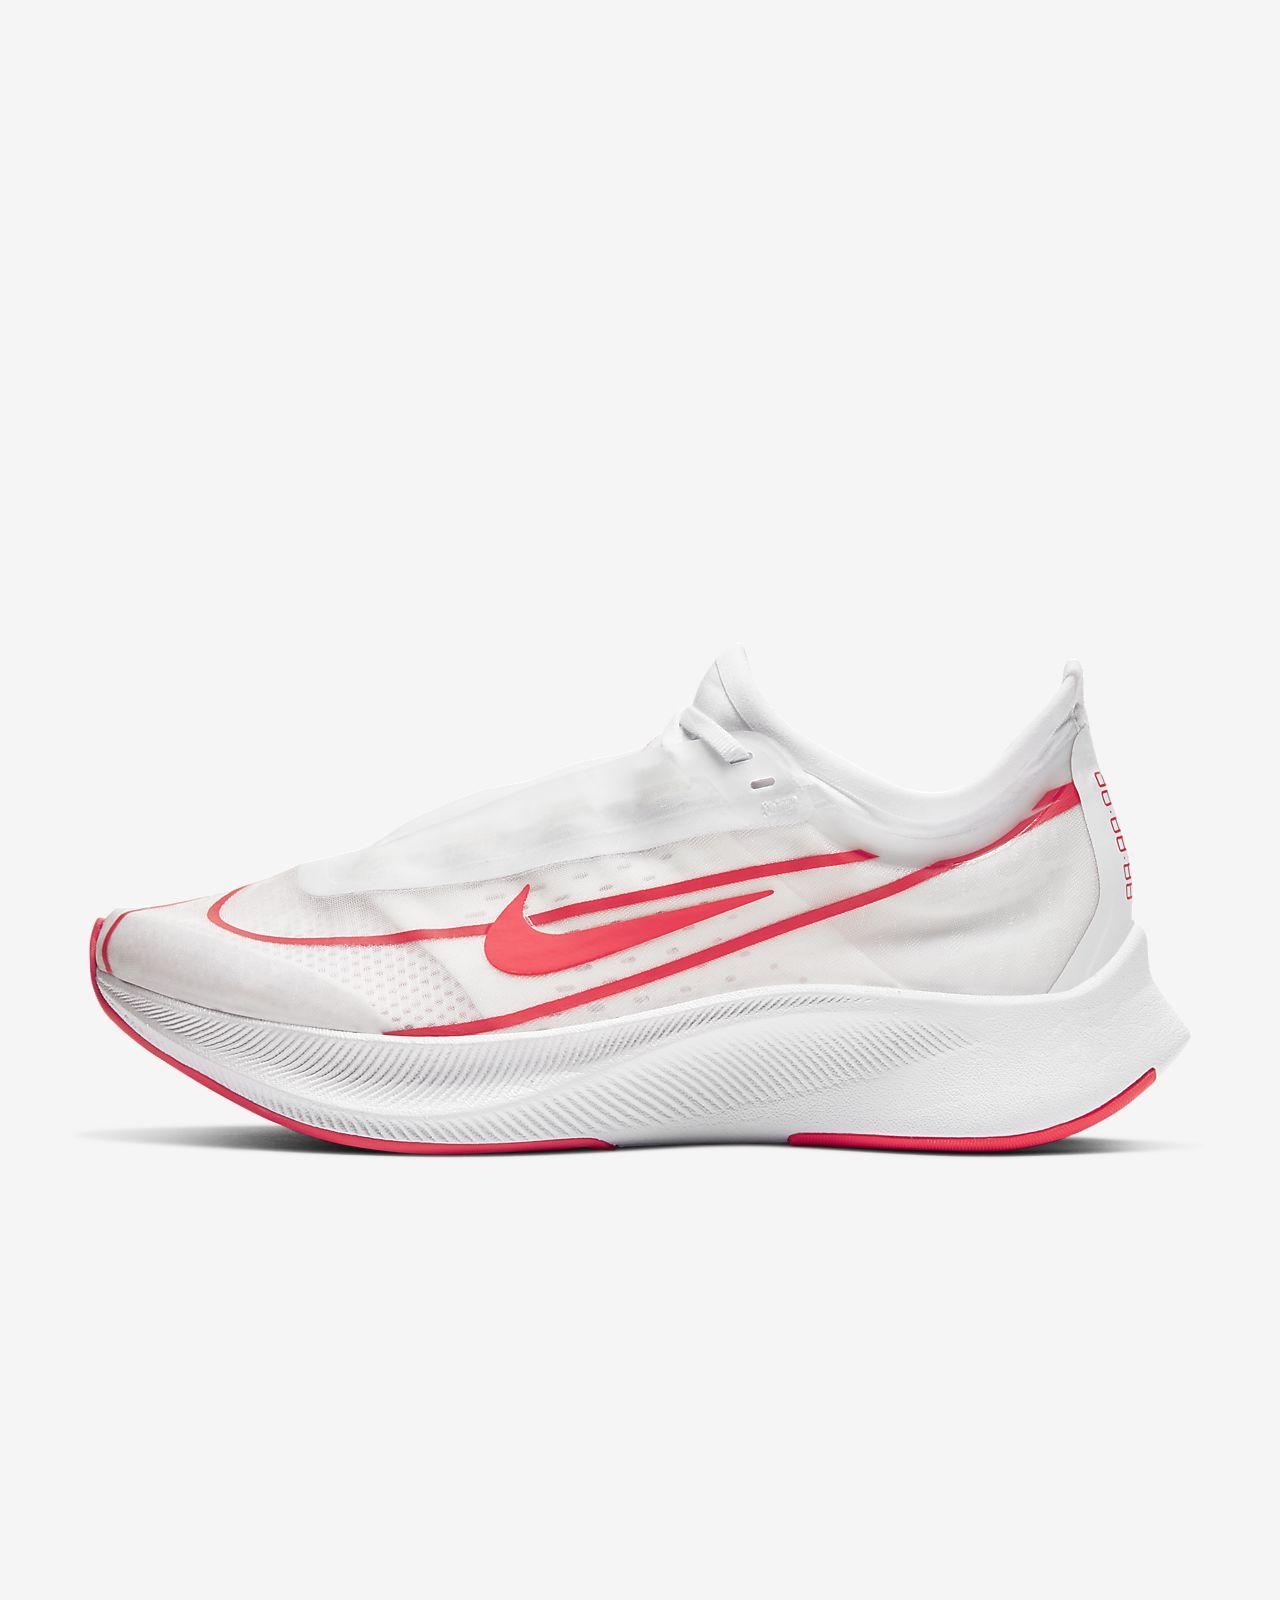 Calzado de running para mujer Nike Zoom Fly 3